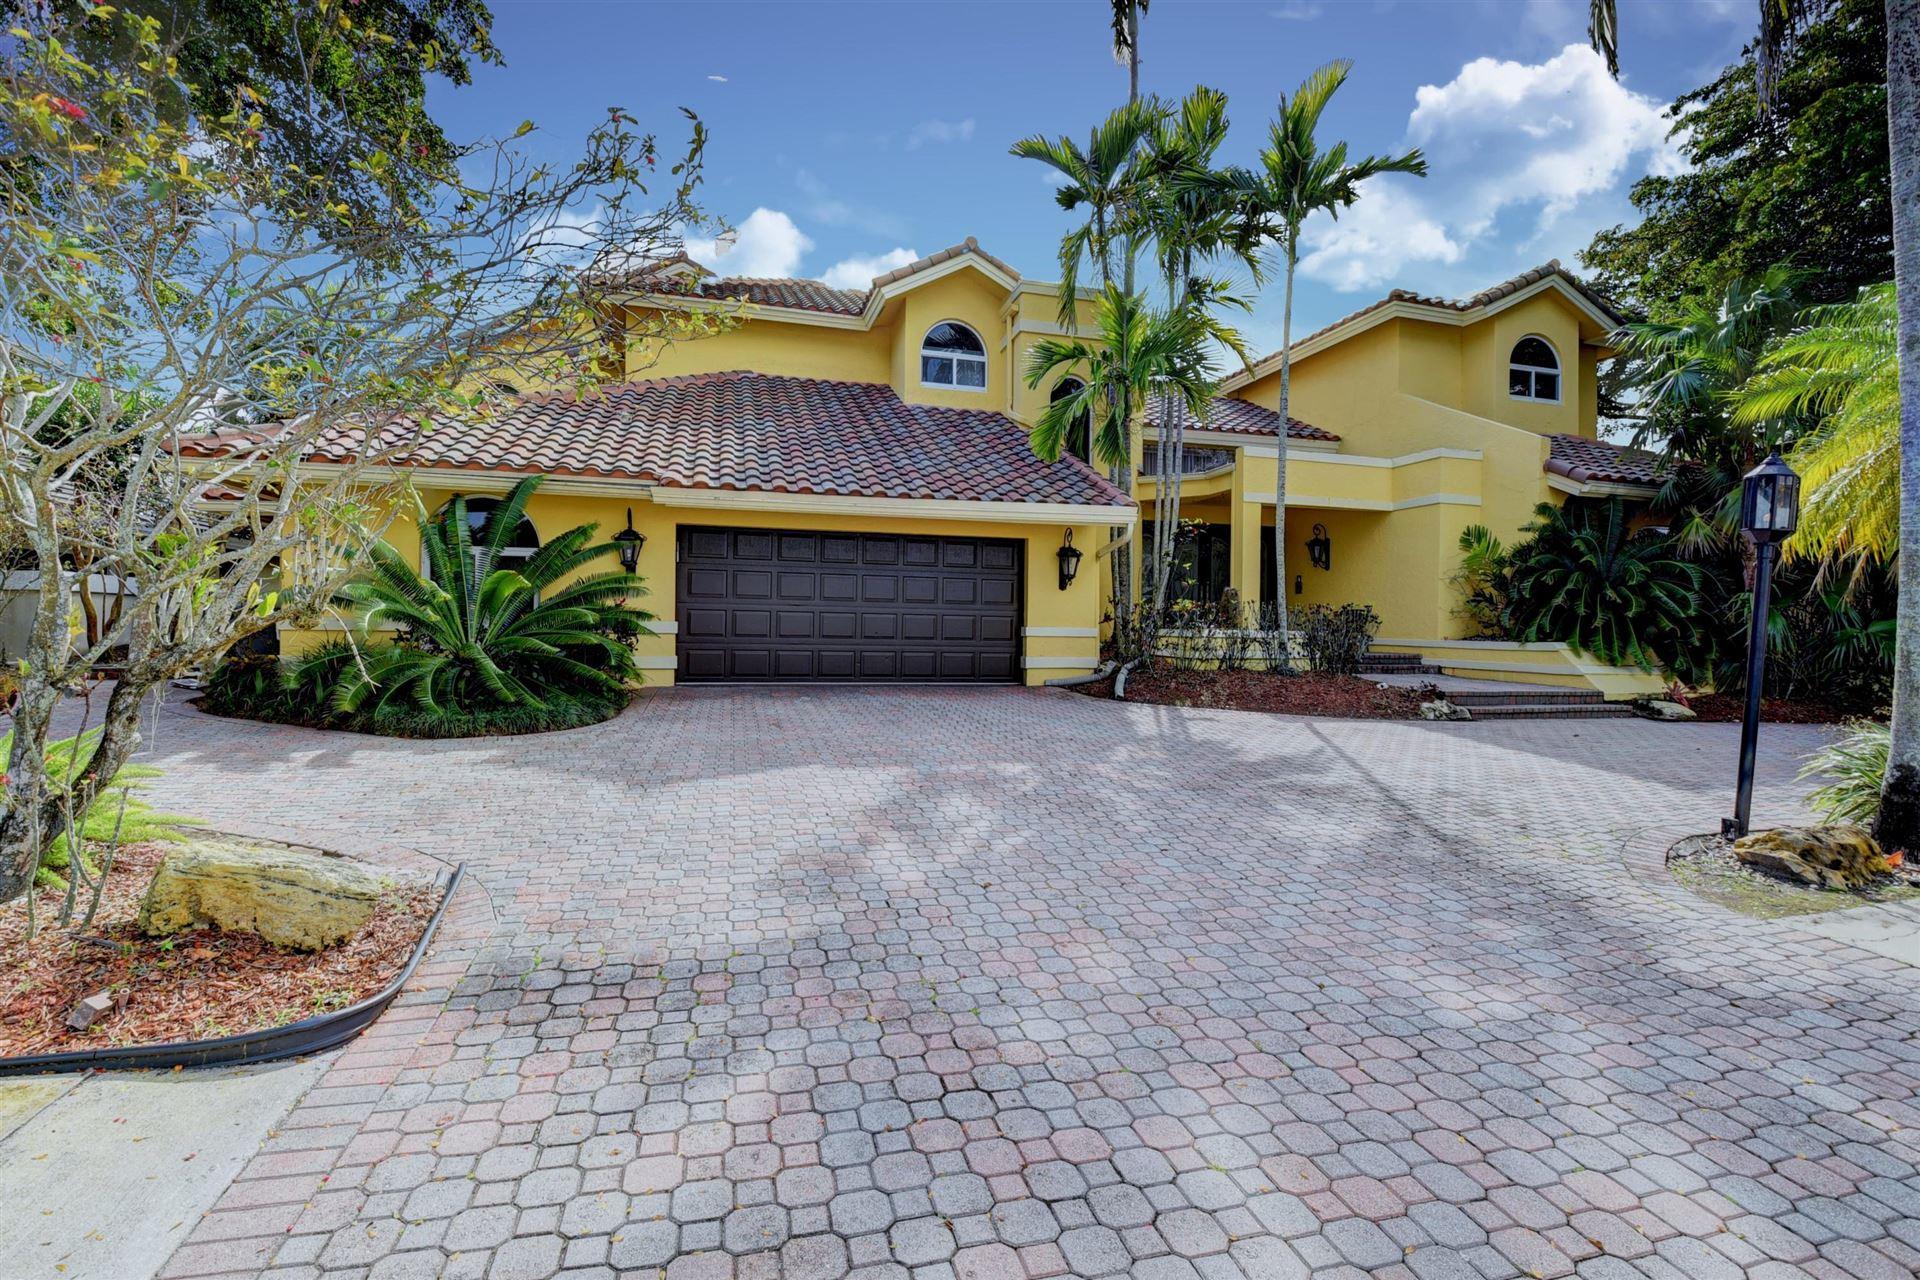 7874 Afton Villa Court, Boca Raton, FL 33433 - #: RX-10600462